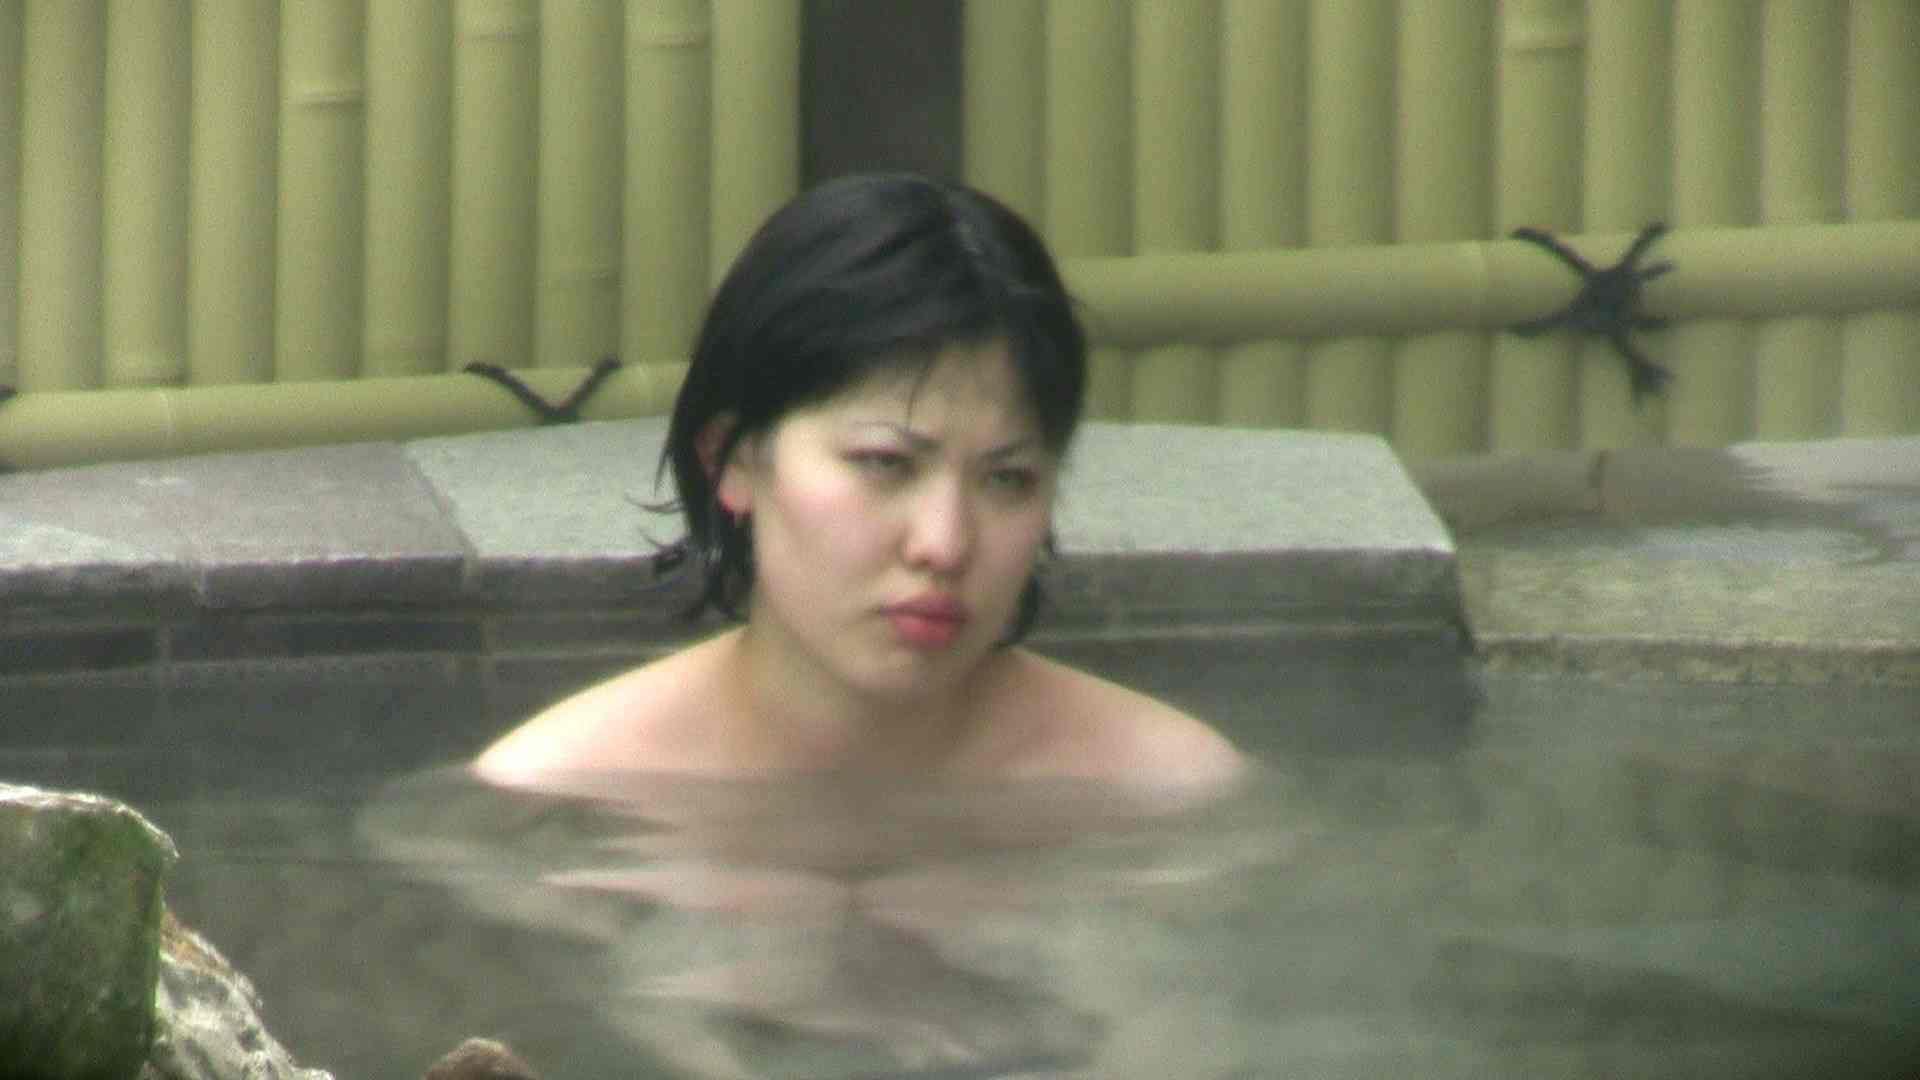 Aquaな露天風呂Vol.114 盗撮映像  72Pix 17